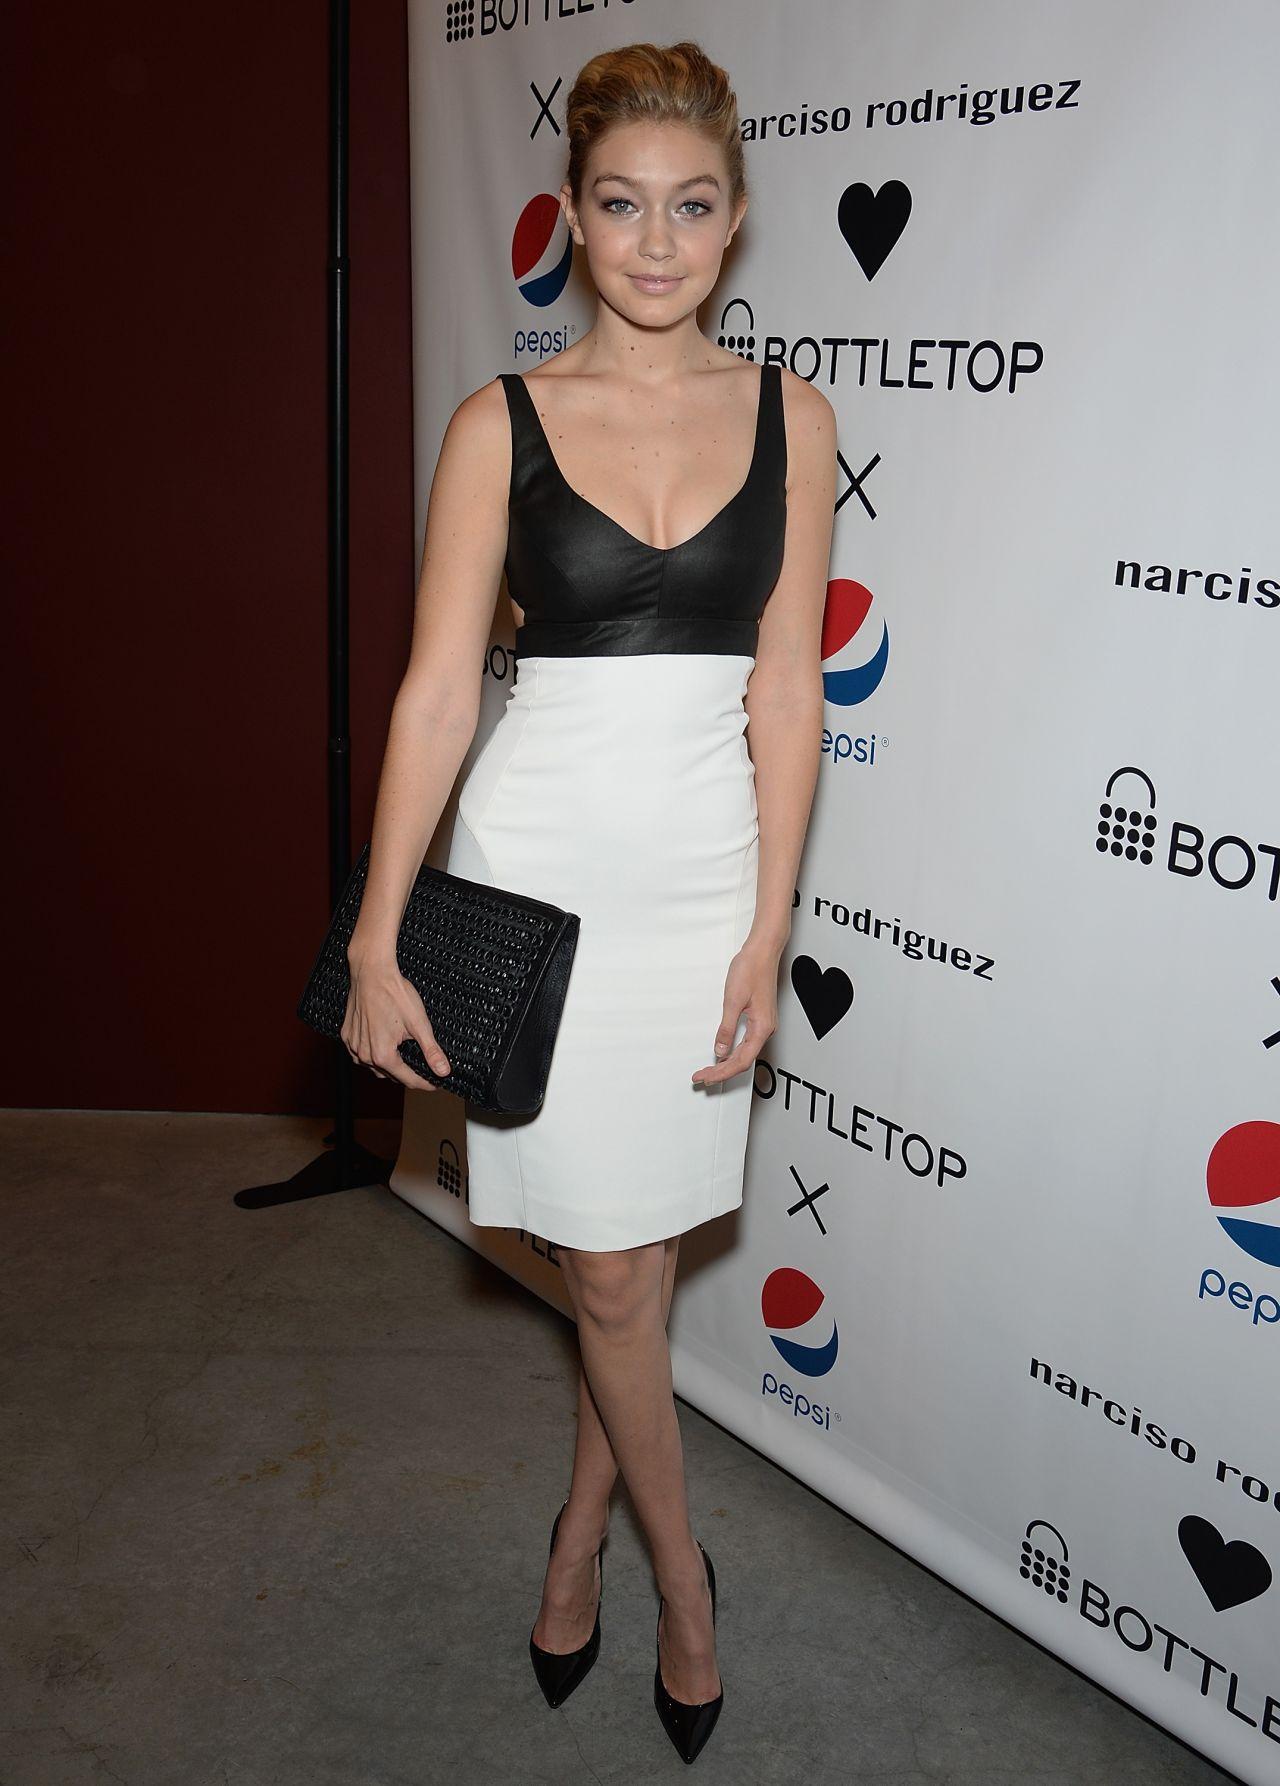 Gigi Hadid – Narciso Rodriguez Bottletop Collection Pepsi Launch - May 2014